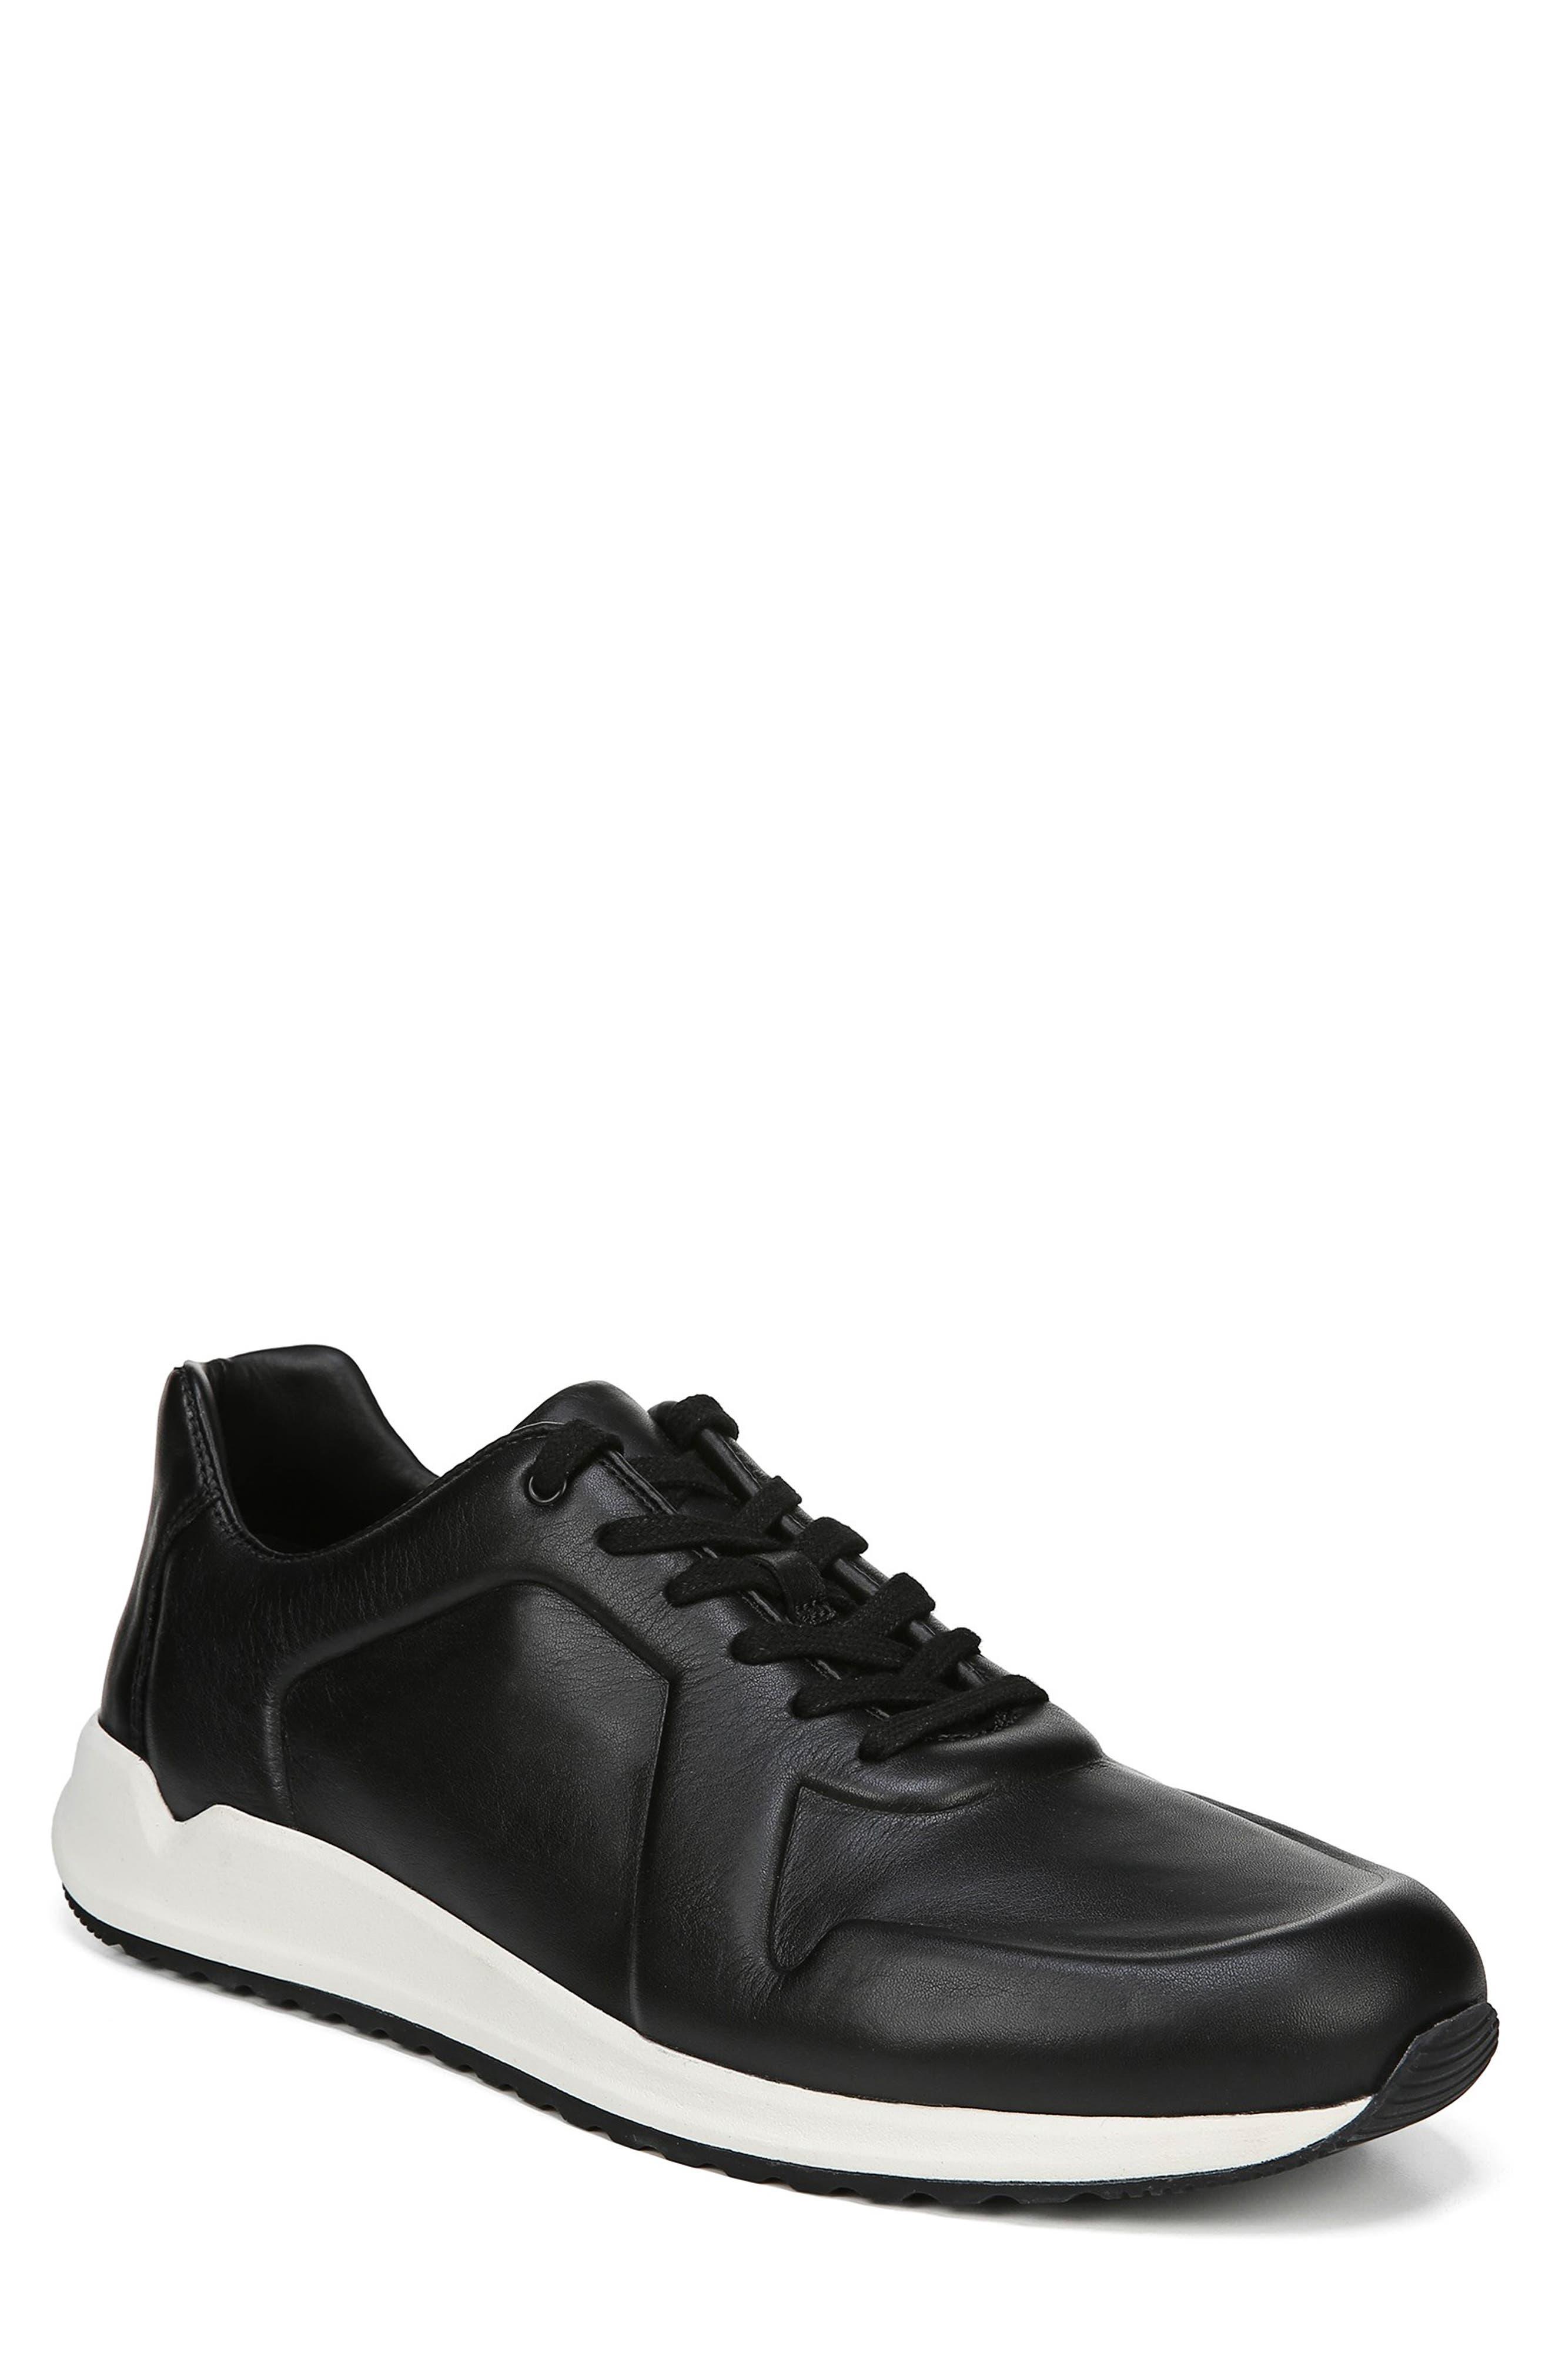 Garrett Sneaker,                             Main thumbnail 1, color,                             BLACK/ BLACK